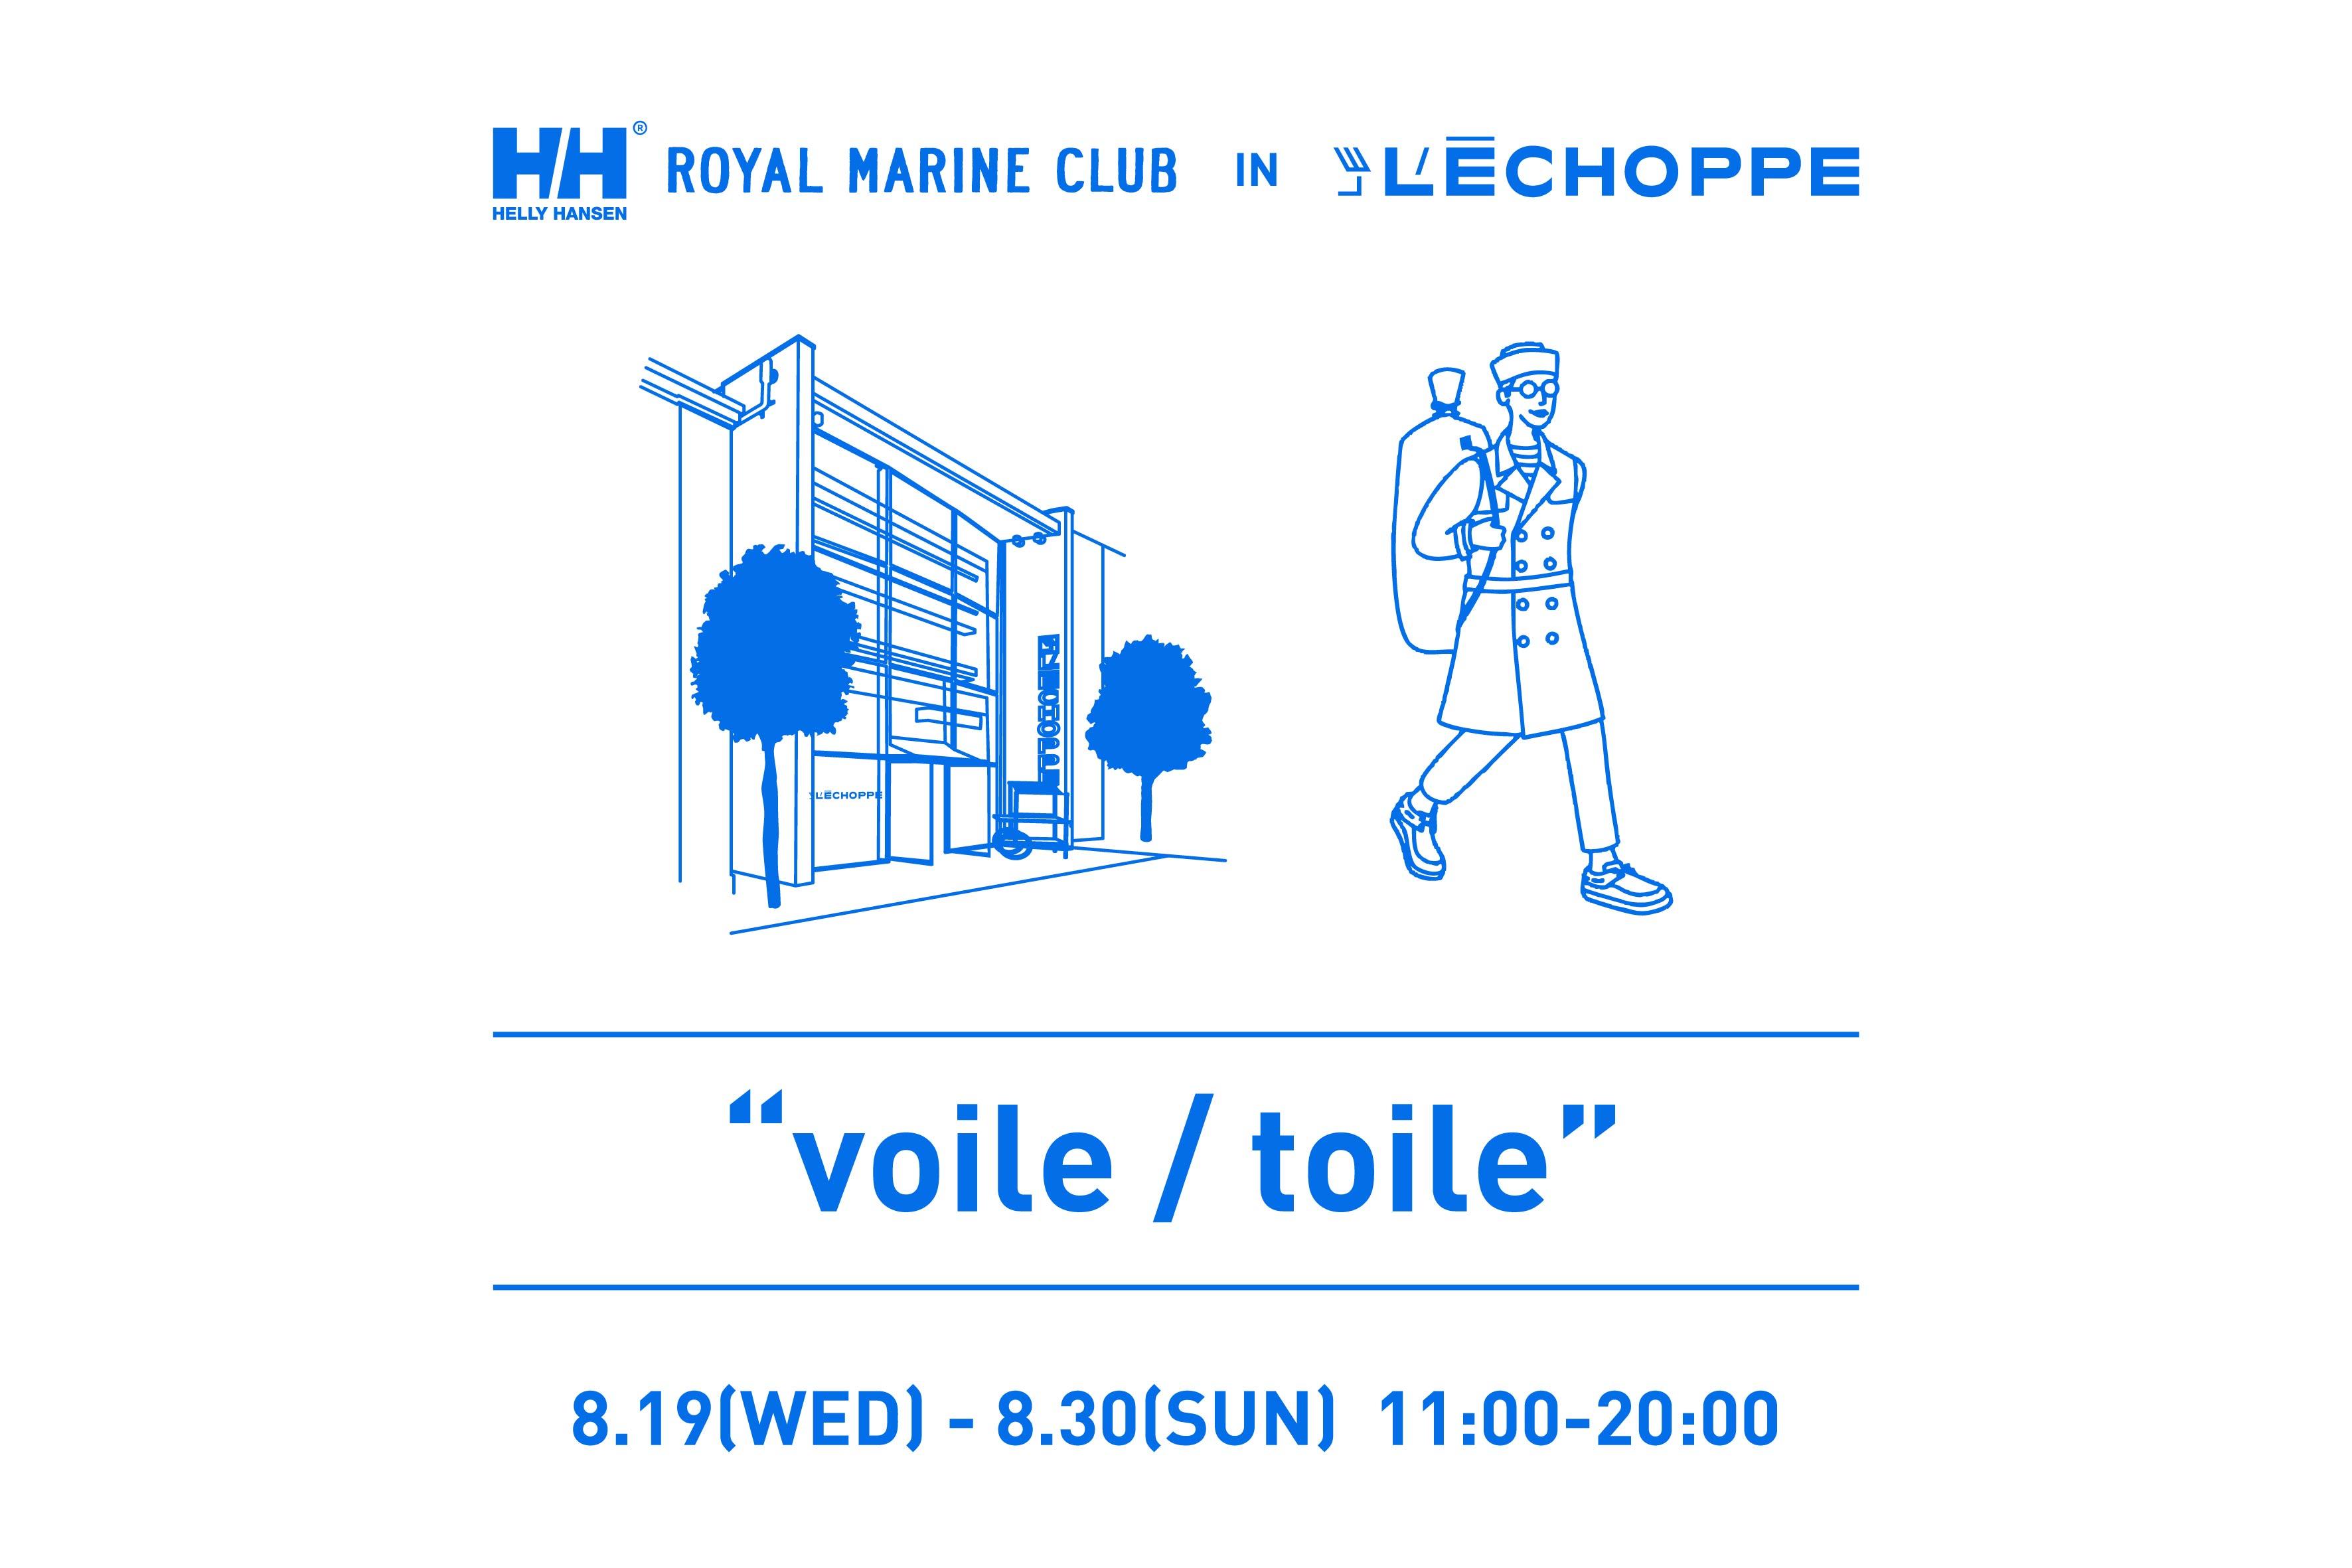 HHRMC-lechoppe-kokuchi-01